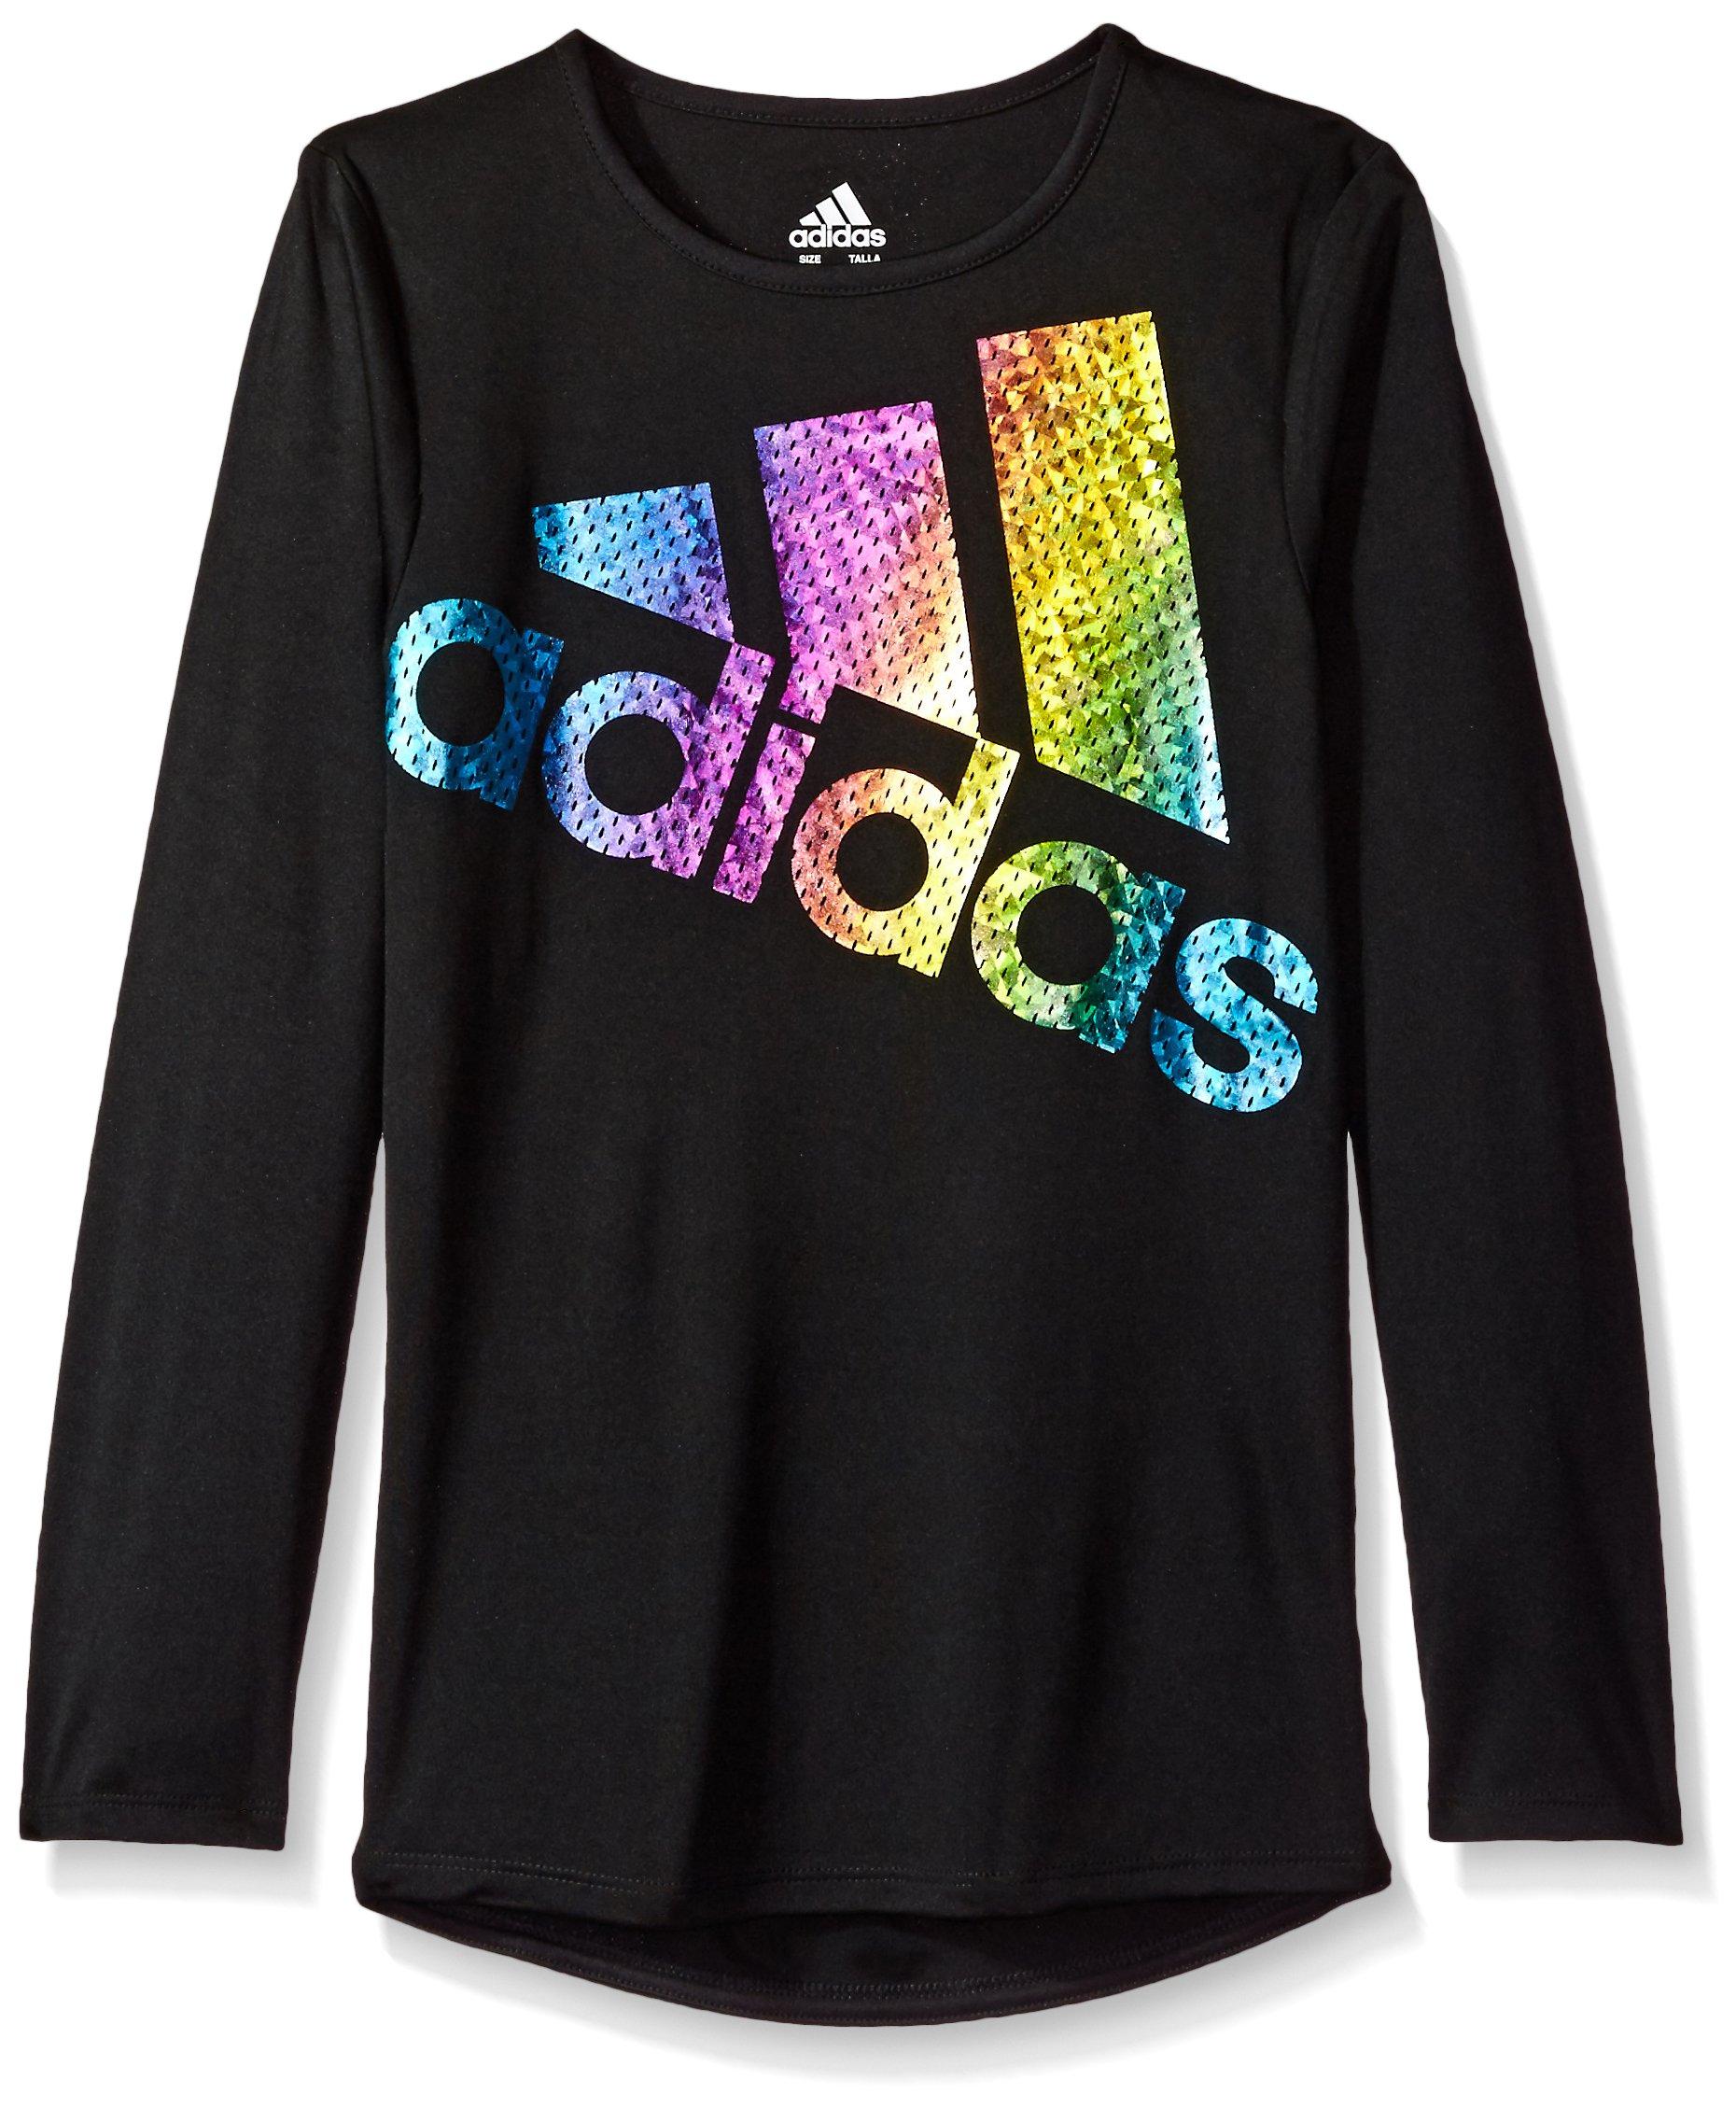 adidas Girls' Little Long Sleeve Logo Tee, Black, 4